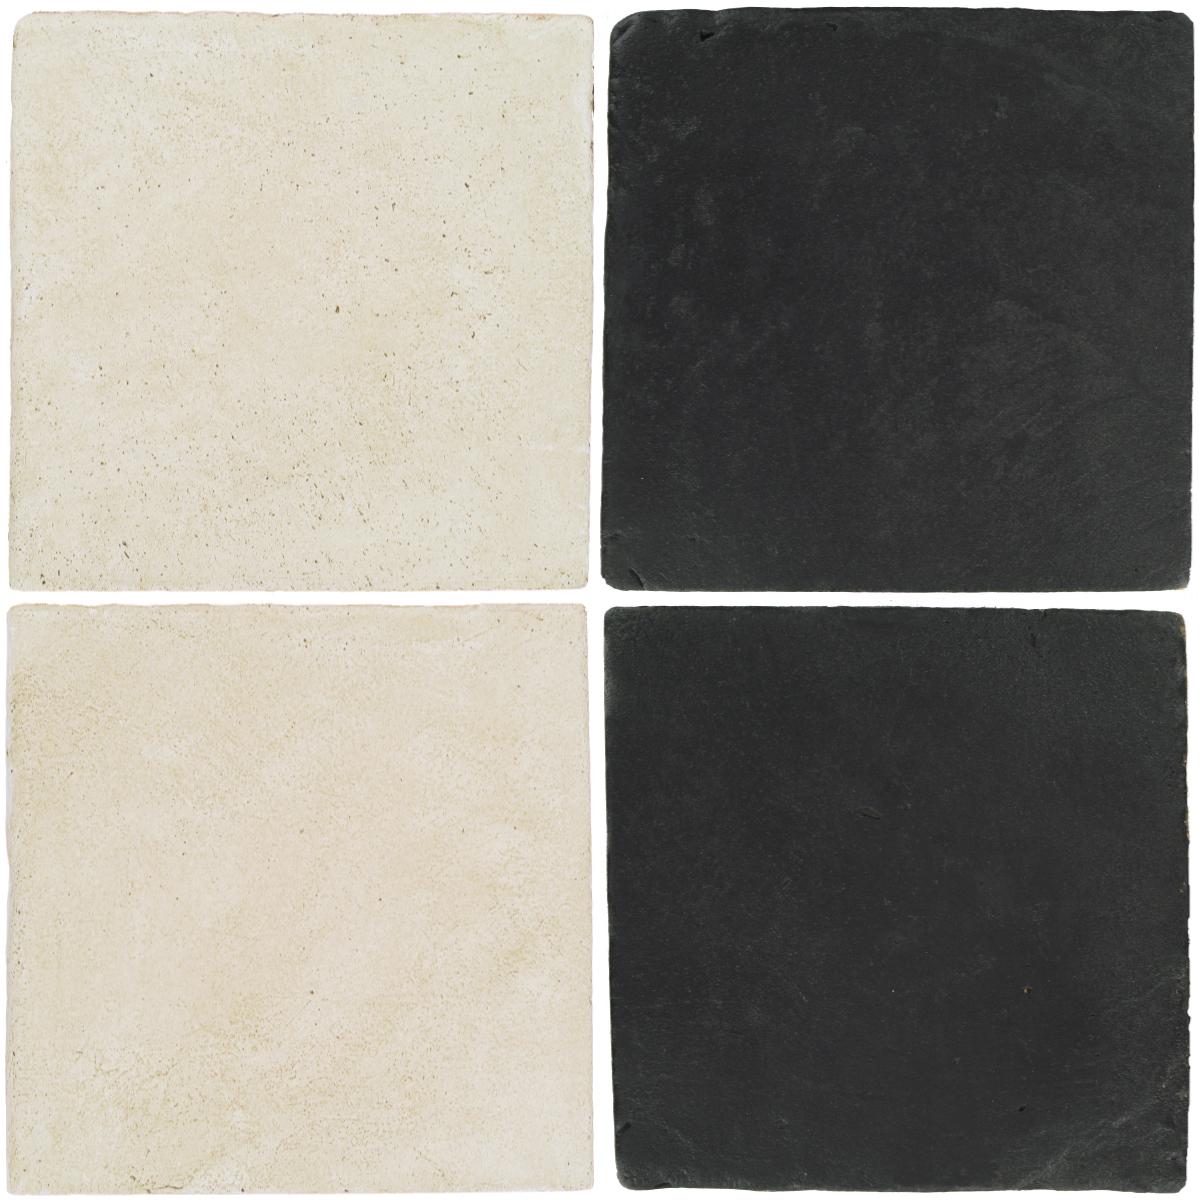 Pedralbes Antique Terracotta  2 Color Combinations  OHS-PGAW Antique White + VTG-PGCB Carbon Black